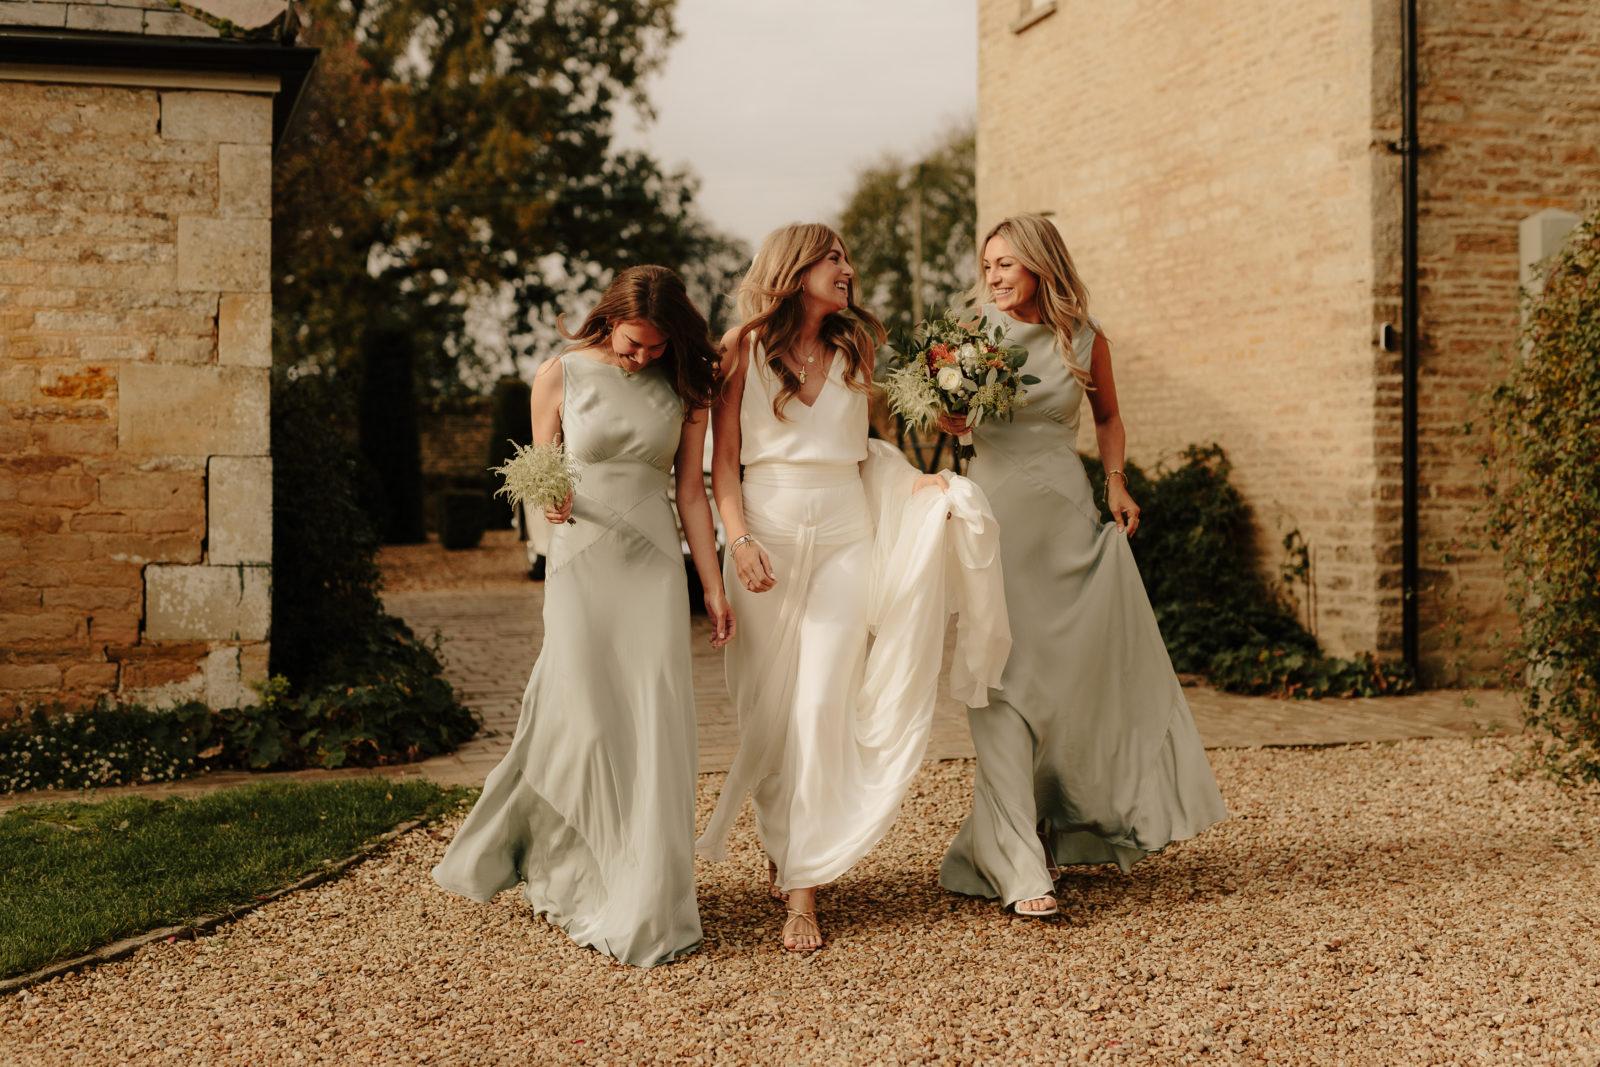 Sinead Crowe Wedding Shoes - Delphine Manivet Dress